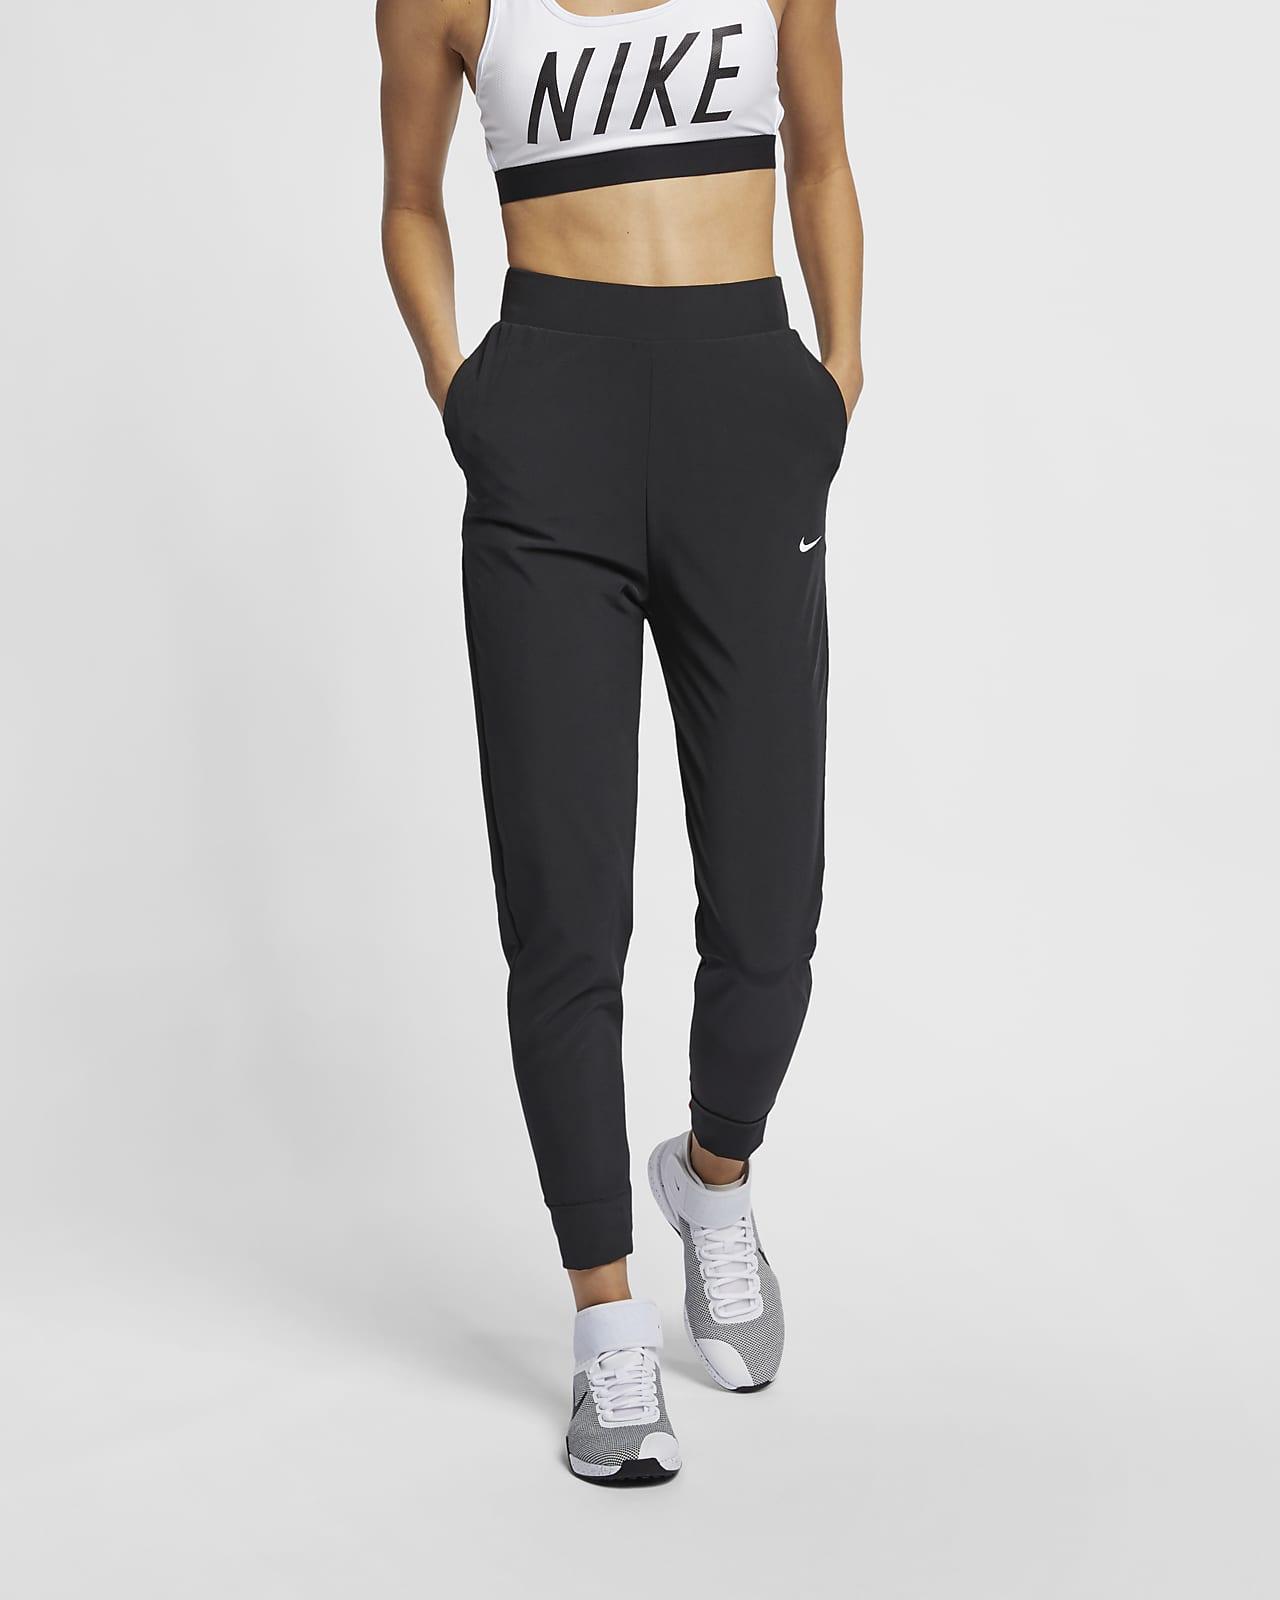 Nike Bliss Women's Training Trousers